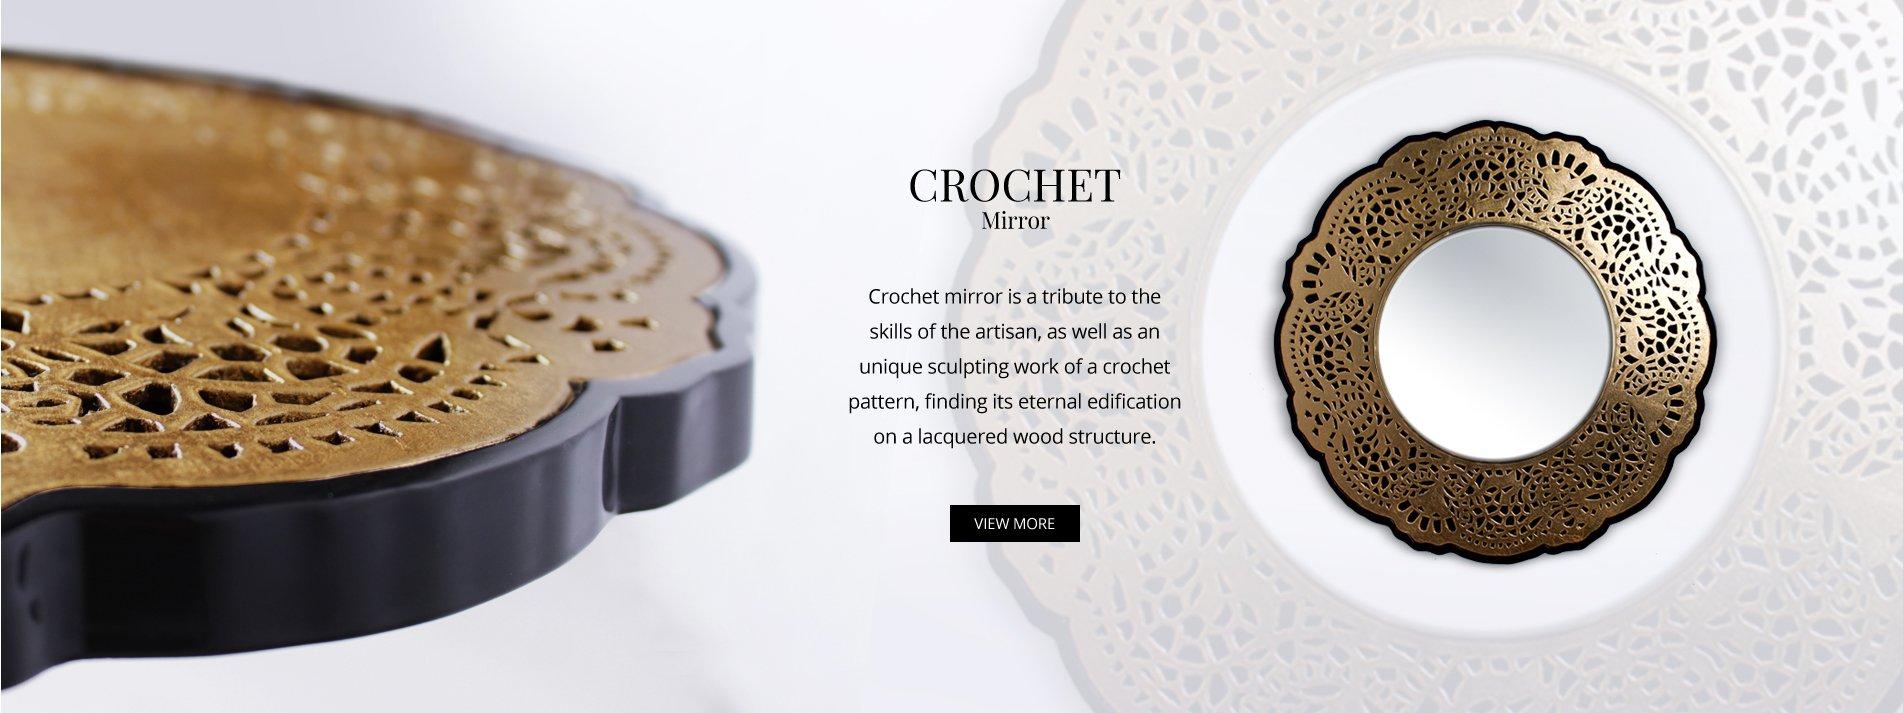 malabar-crochet-mirror-homepage